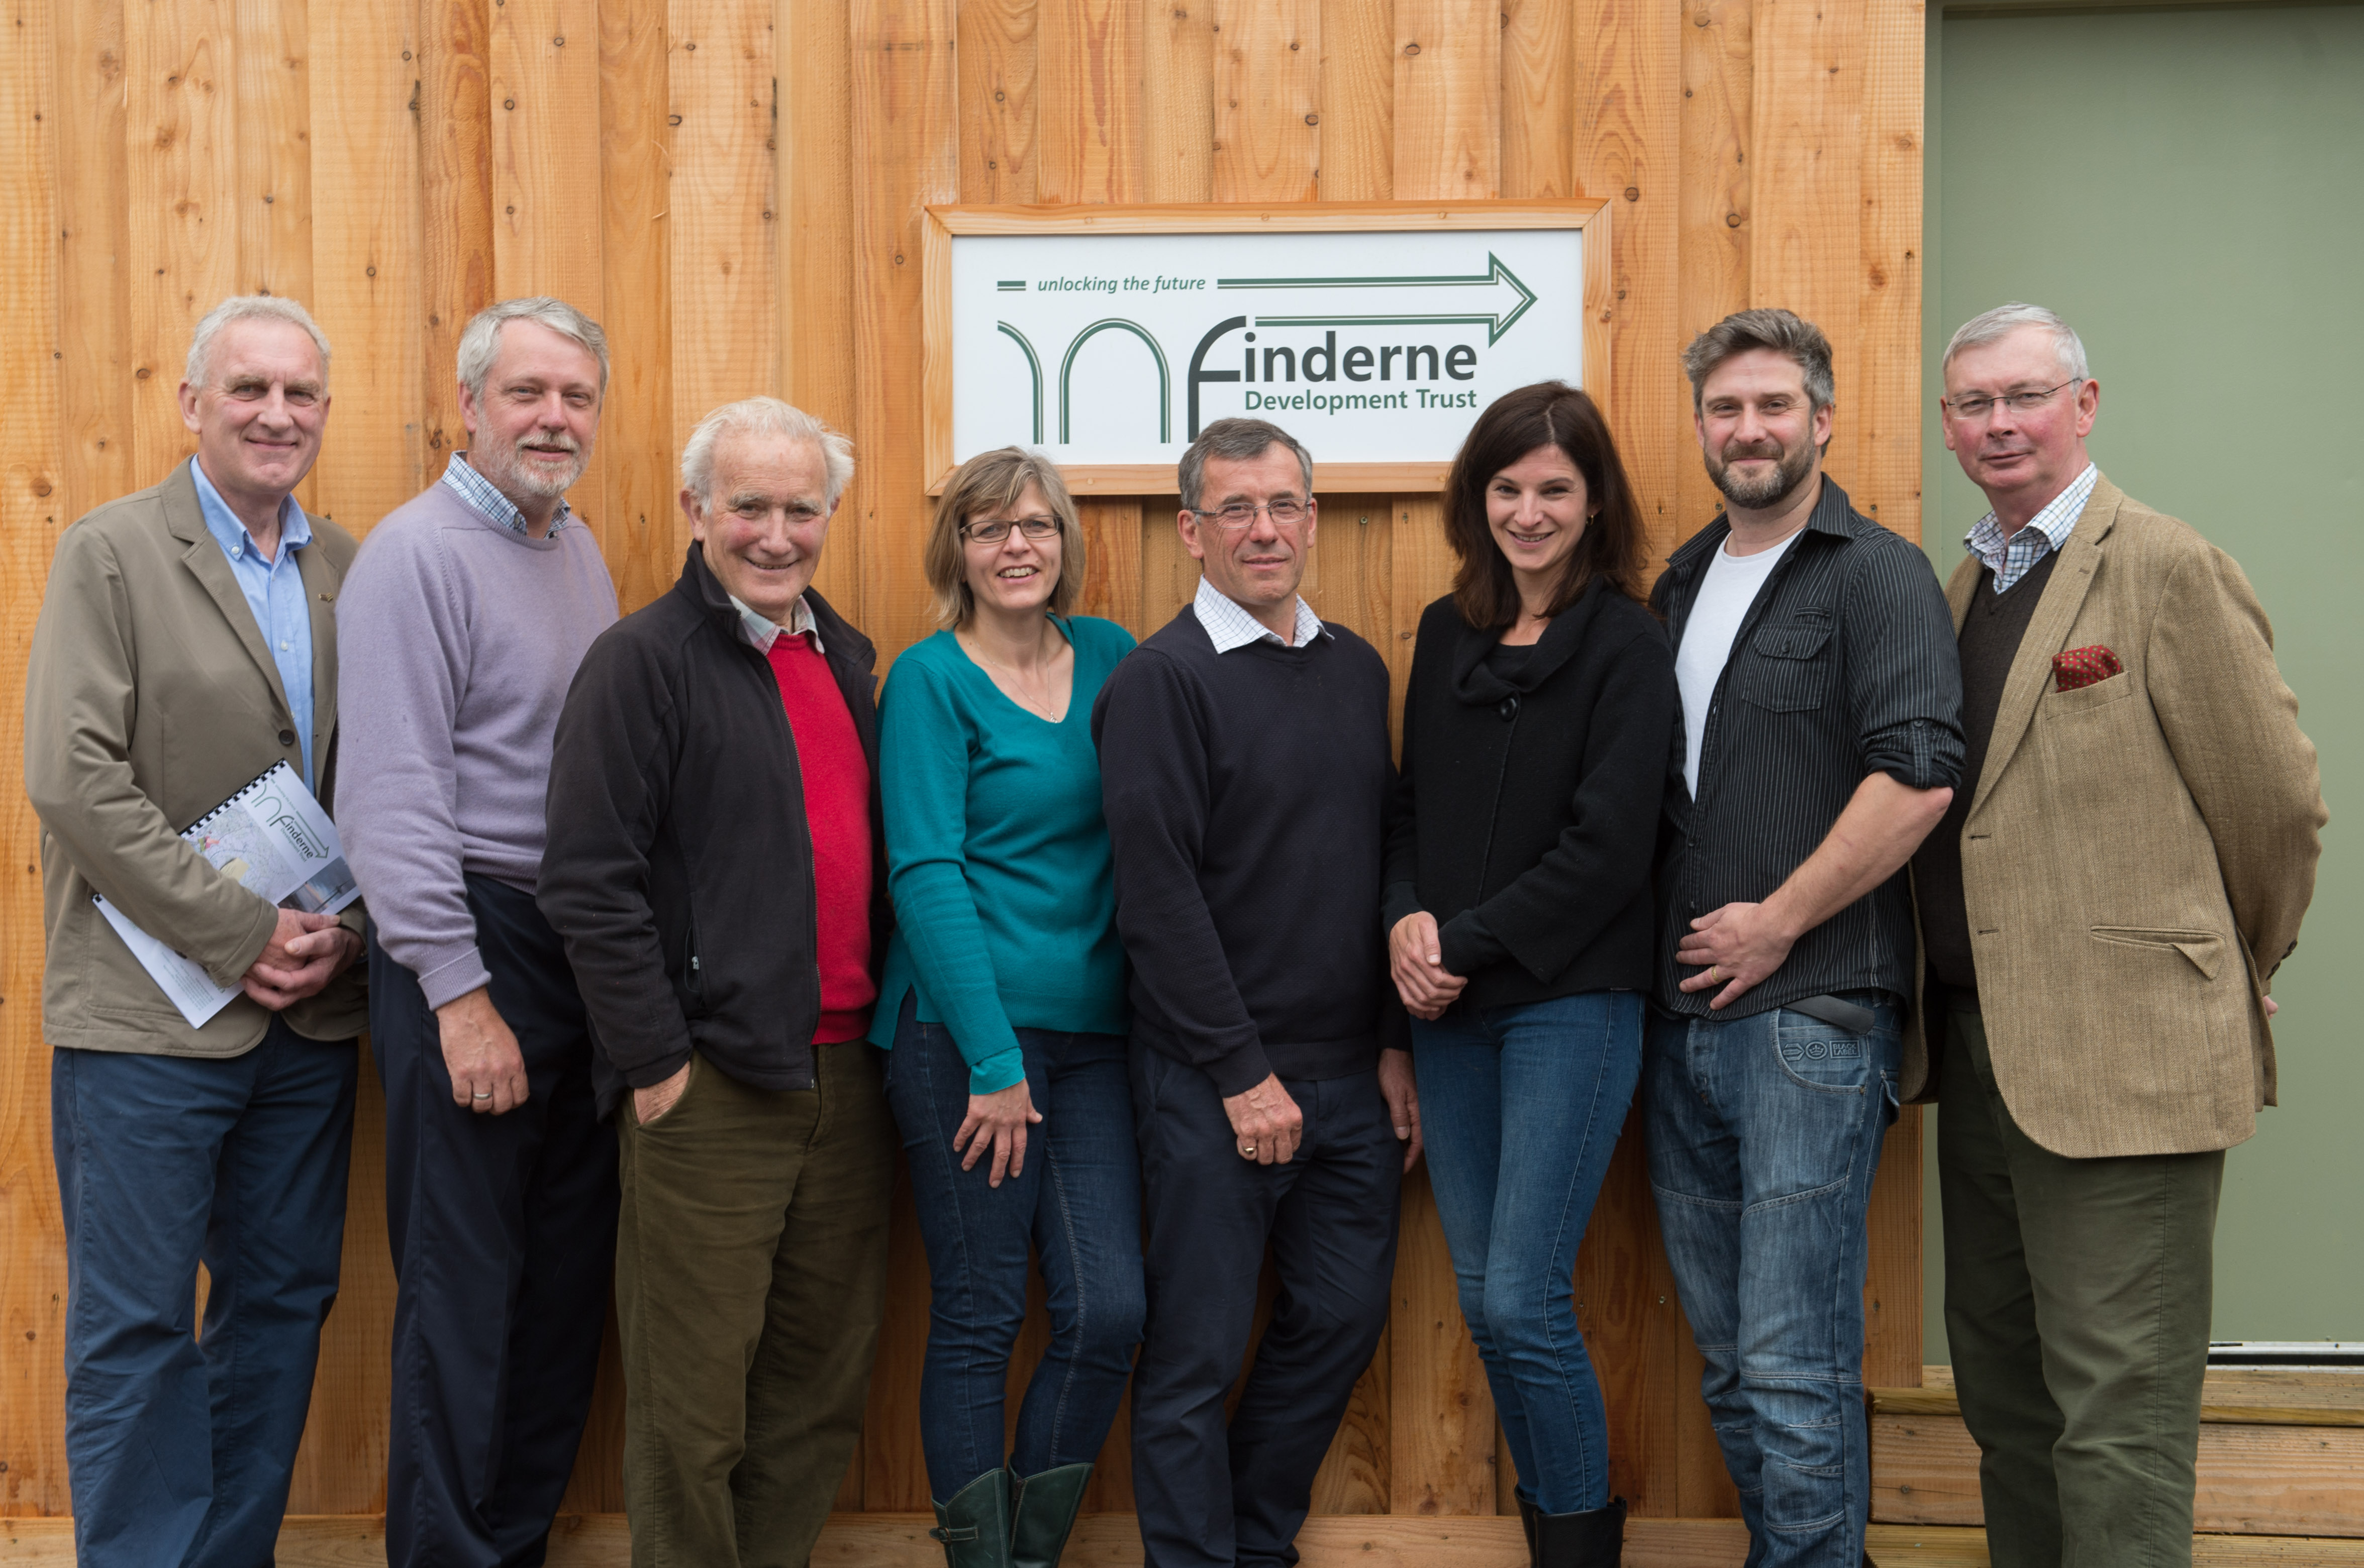 Members of Finderne Development Trust. Pictured: Jo Laing, Karen Astil, Brian Higgs, Peter Taylor, Carlo Miele, Roy Dennis, John Cudworth, Chris Piper.